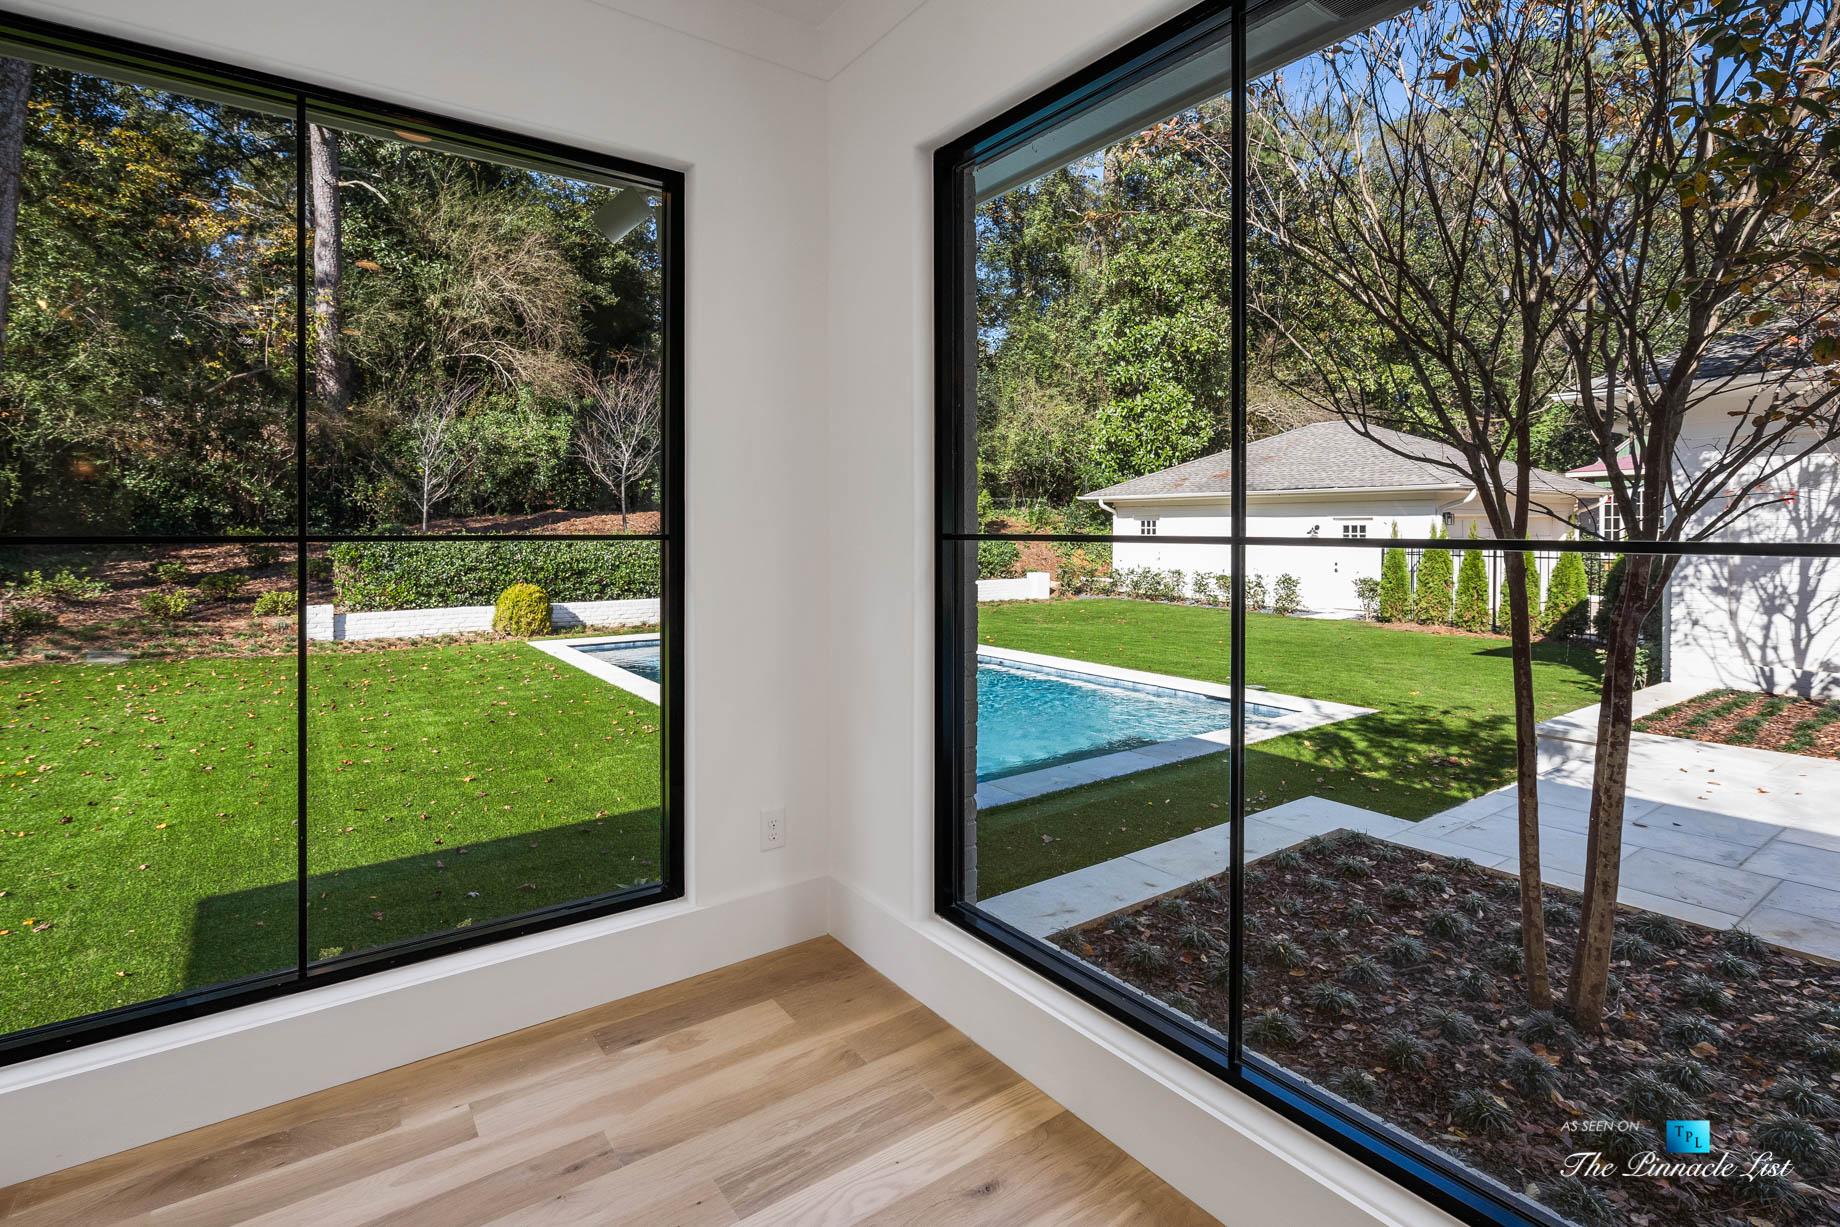 447 Valley Rd NW, Atlanta, GA, USA – Master Bedroom Pool View- Luxury Real Estate – Tuxedo Park Home